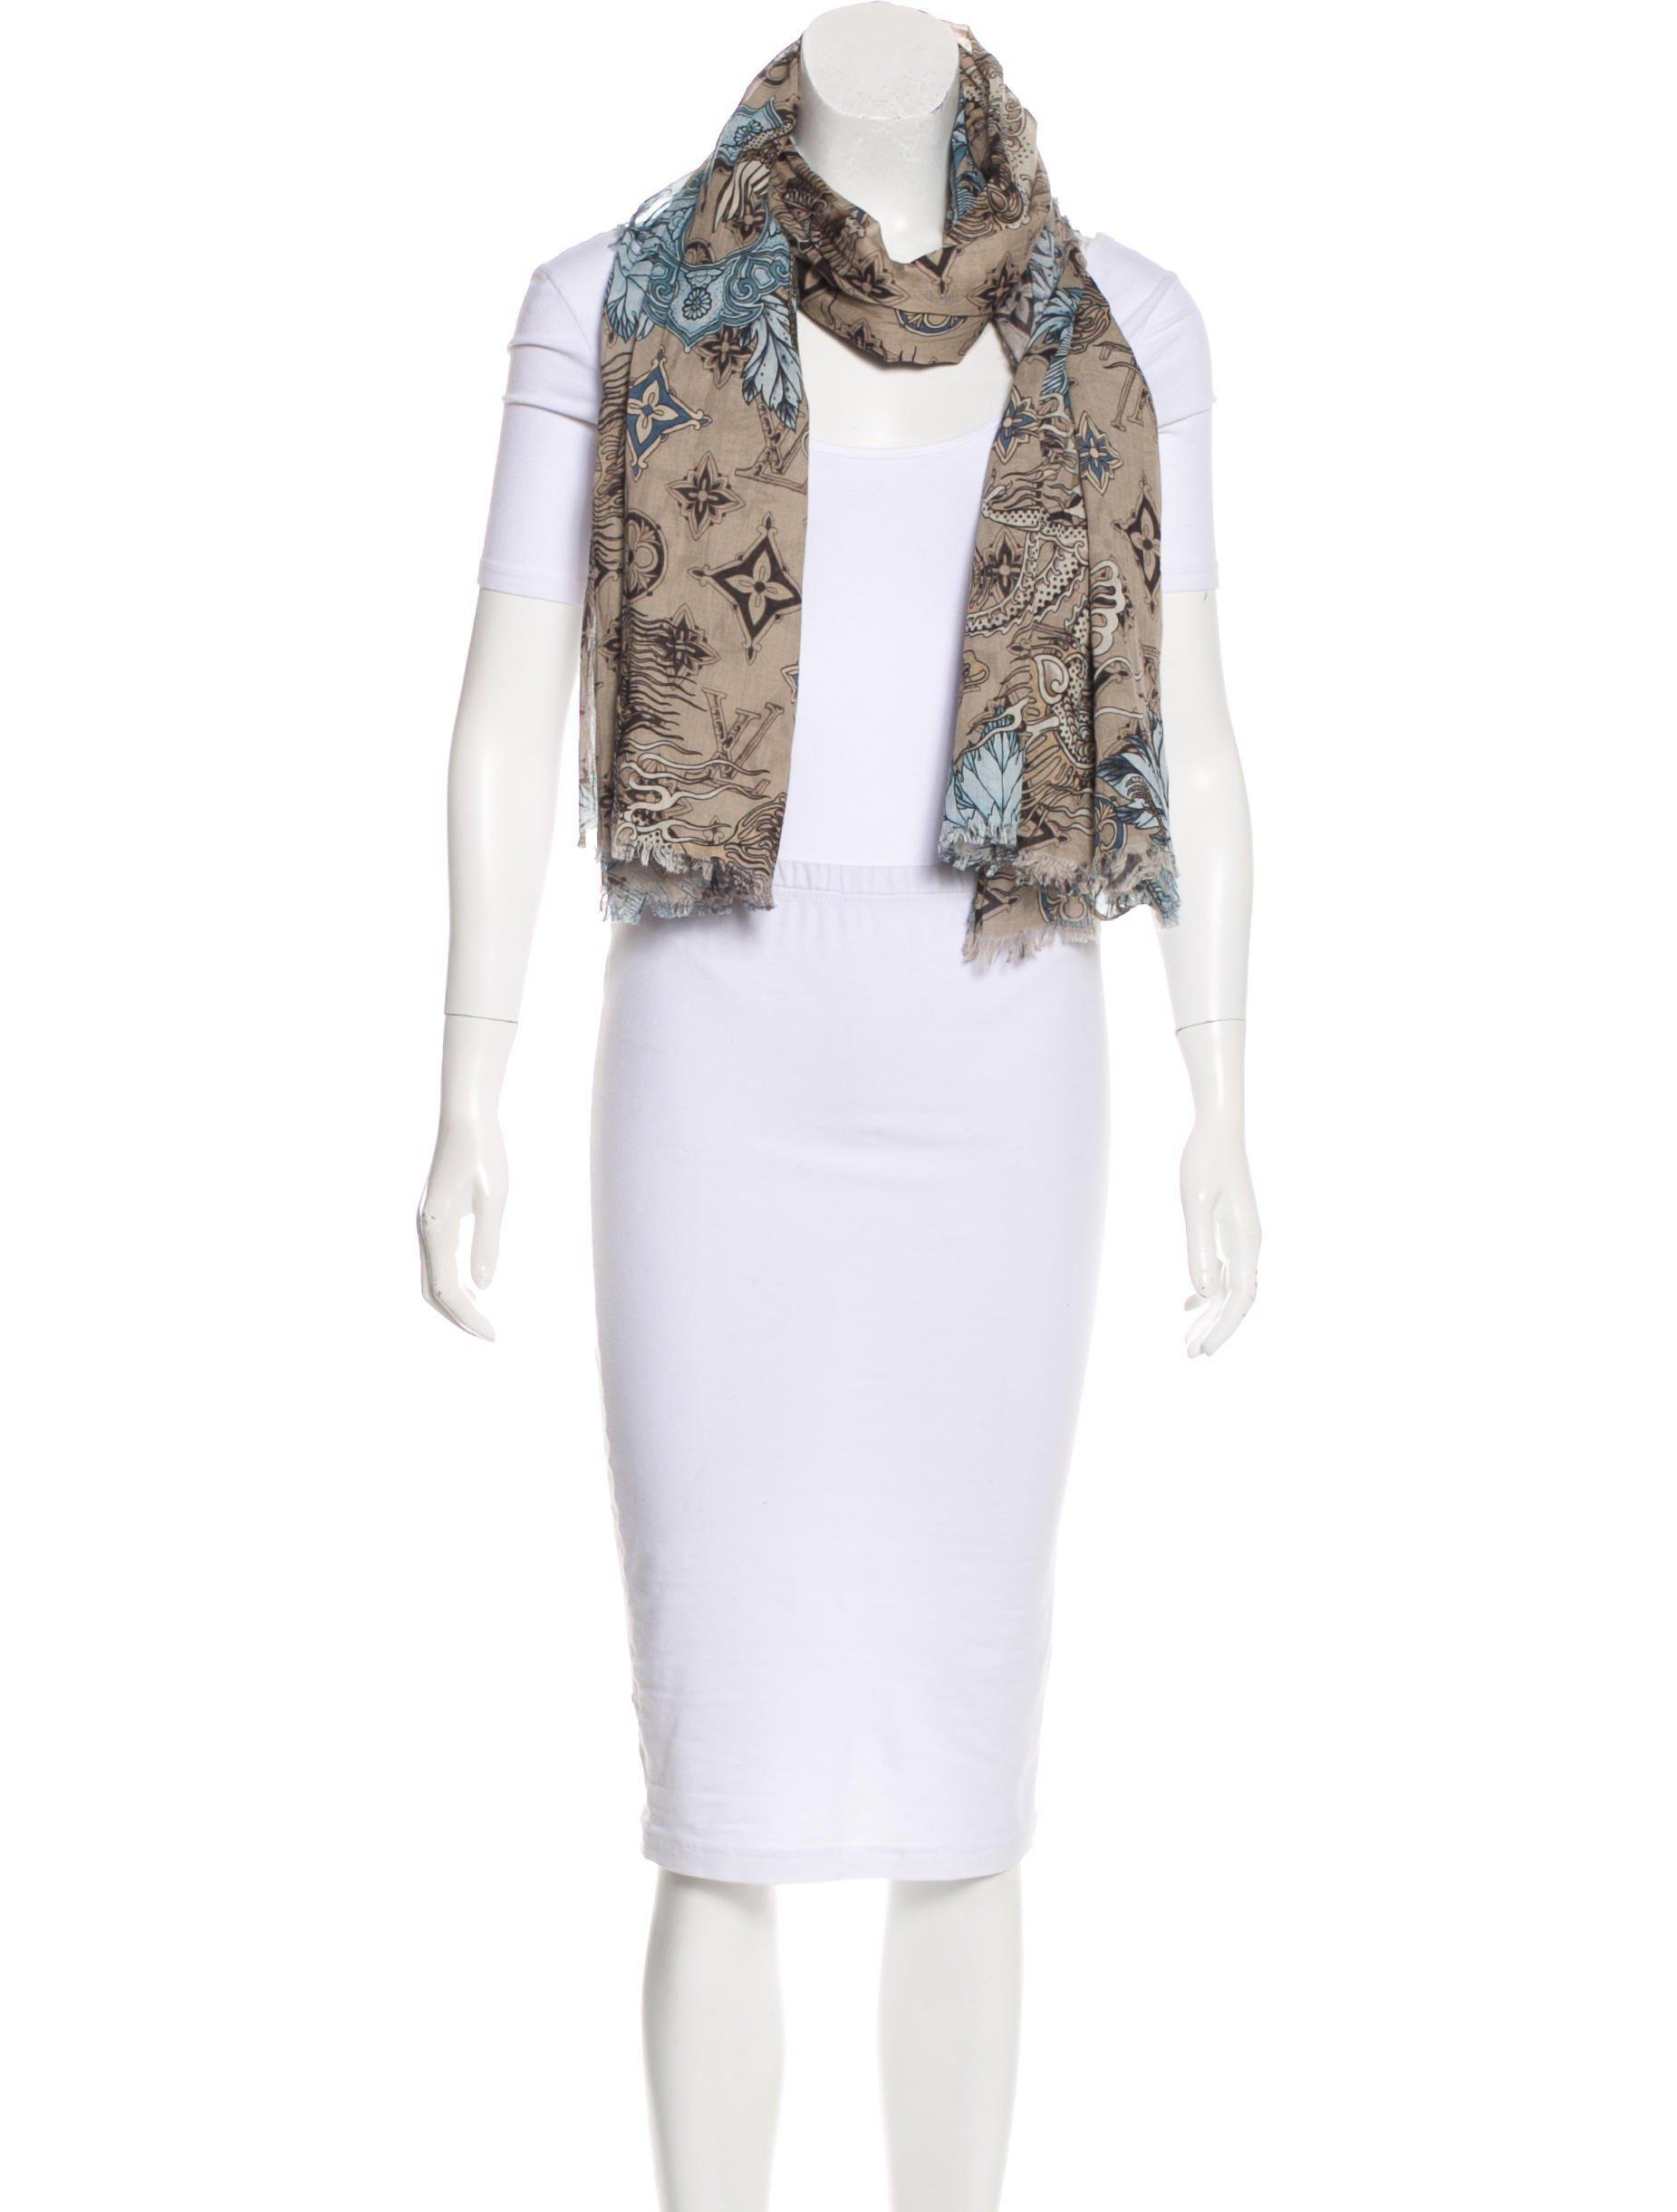 franco saks gallery black in ferrari scarf vintage product print accessories oversized lyst